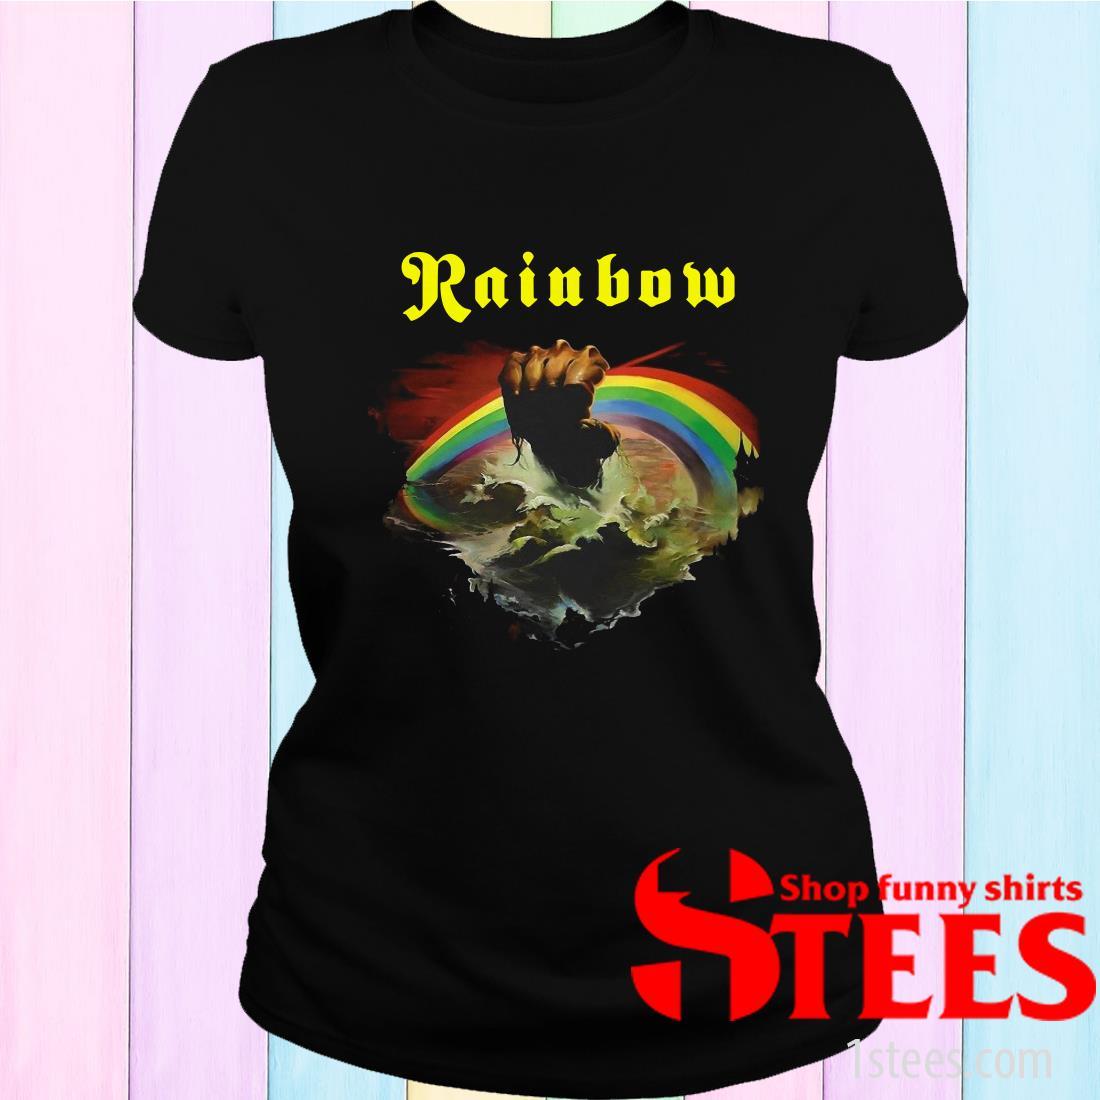 Rising Rainbow Version Women's T-Shirt